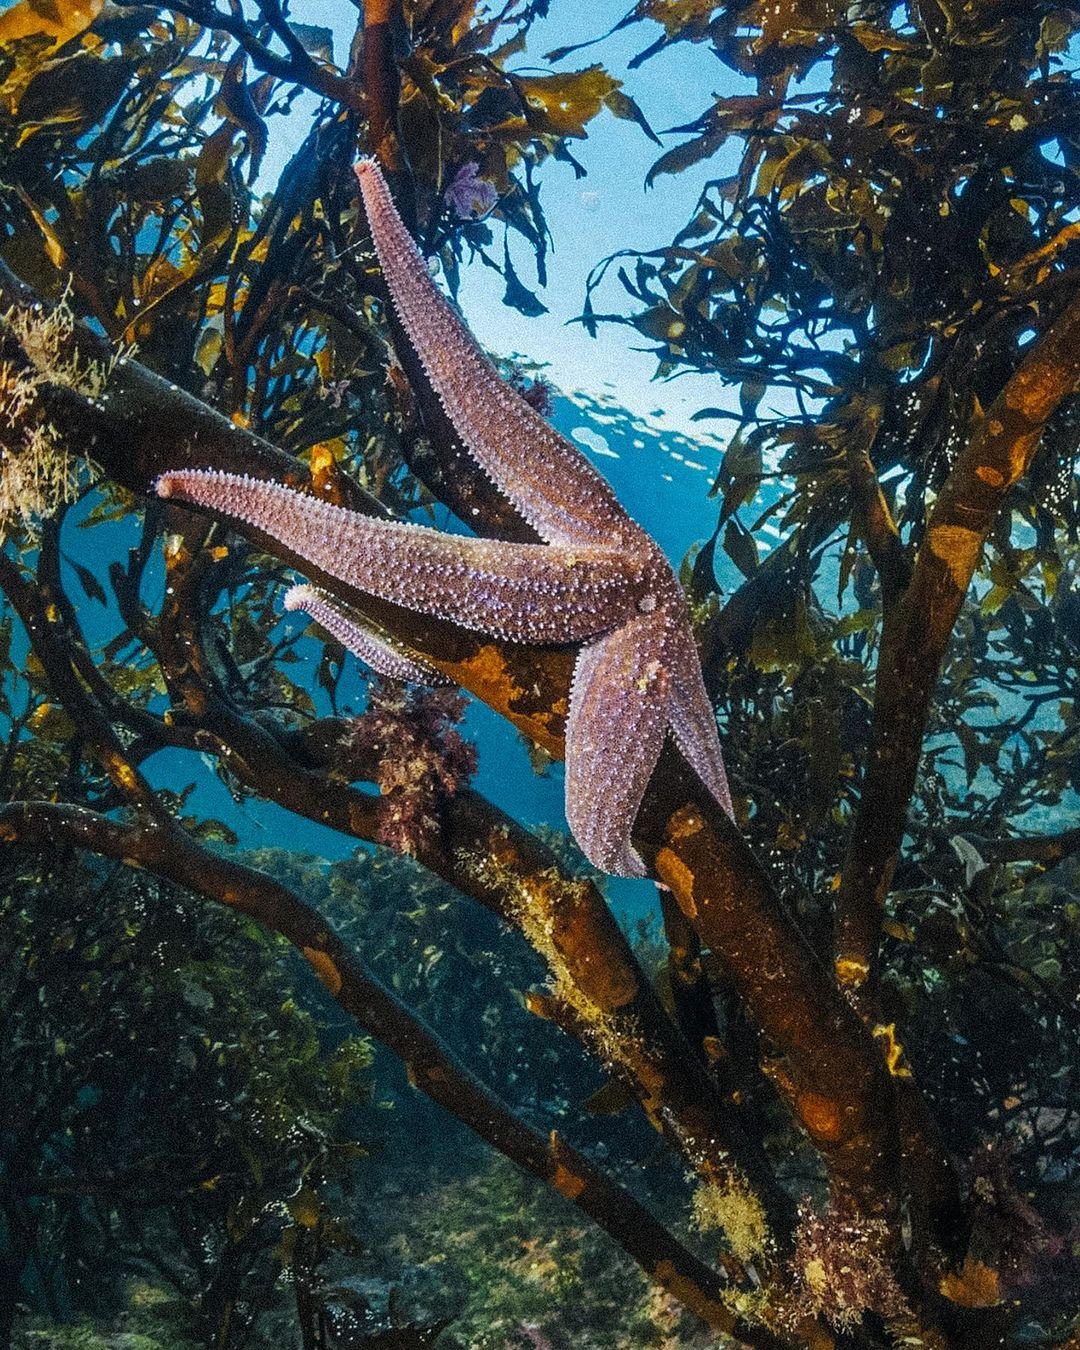 Starfish, another marine species in danger of extinction